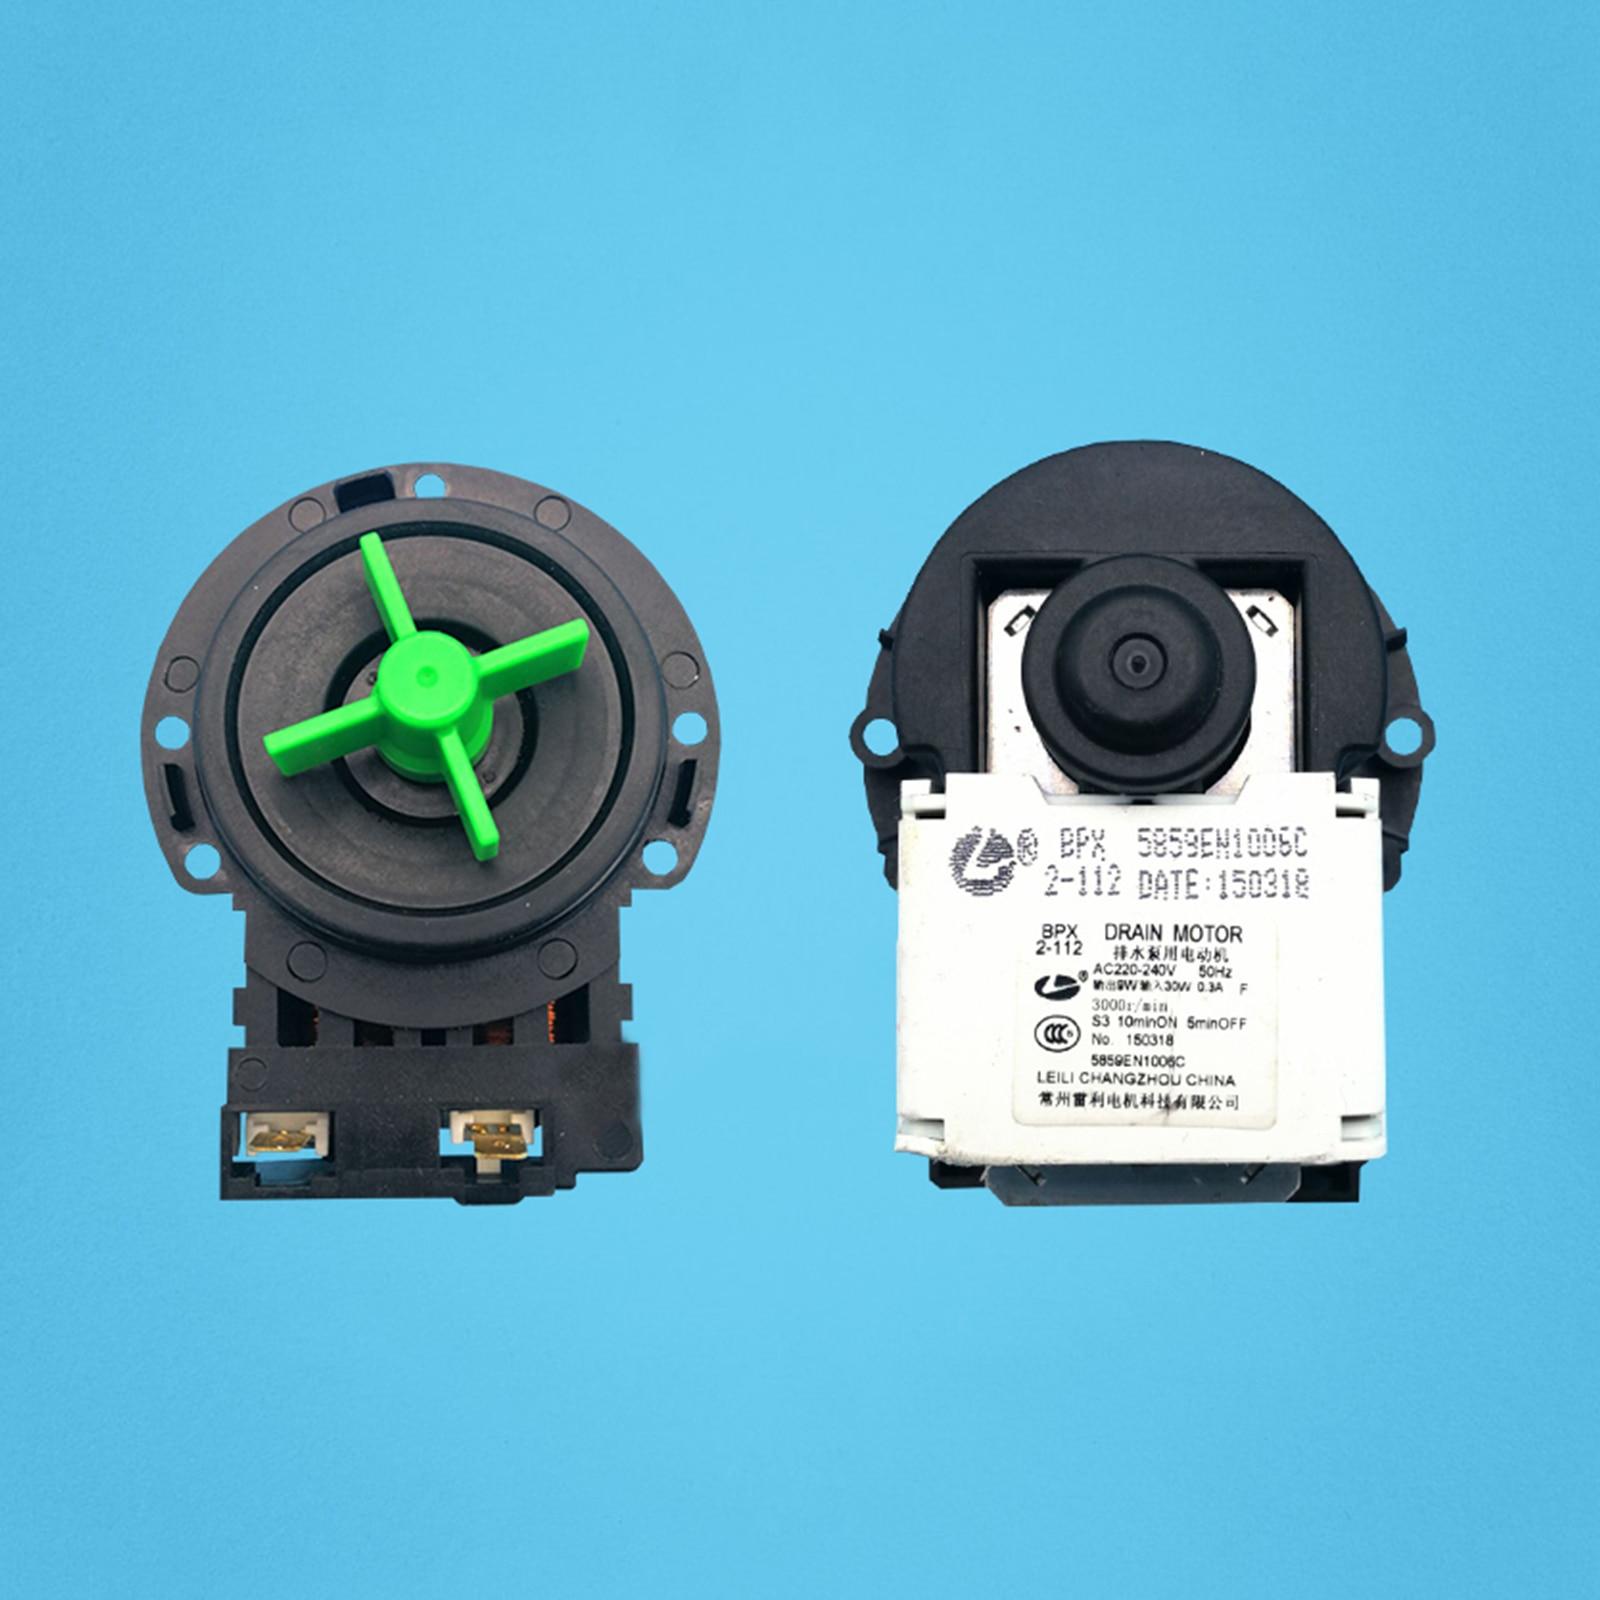 1PC Afvoer Pomp Motor Vervanging BPX2-8 BPX2-7 BPX2-32 Motor voor LG Drum Wasmachine Onderdelen Hoge Kwaliteit